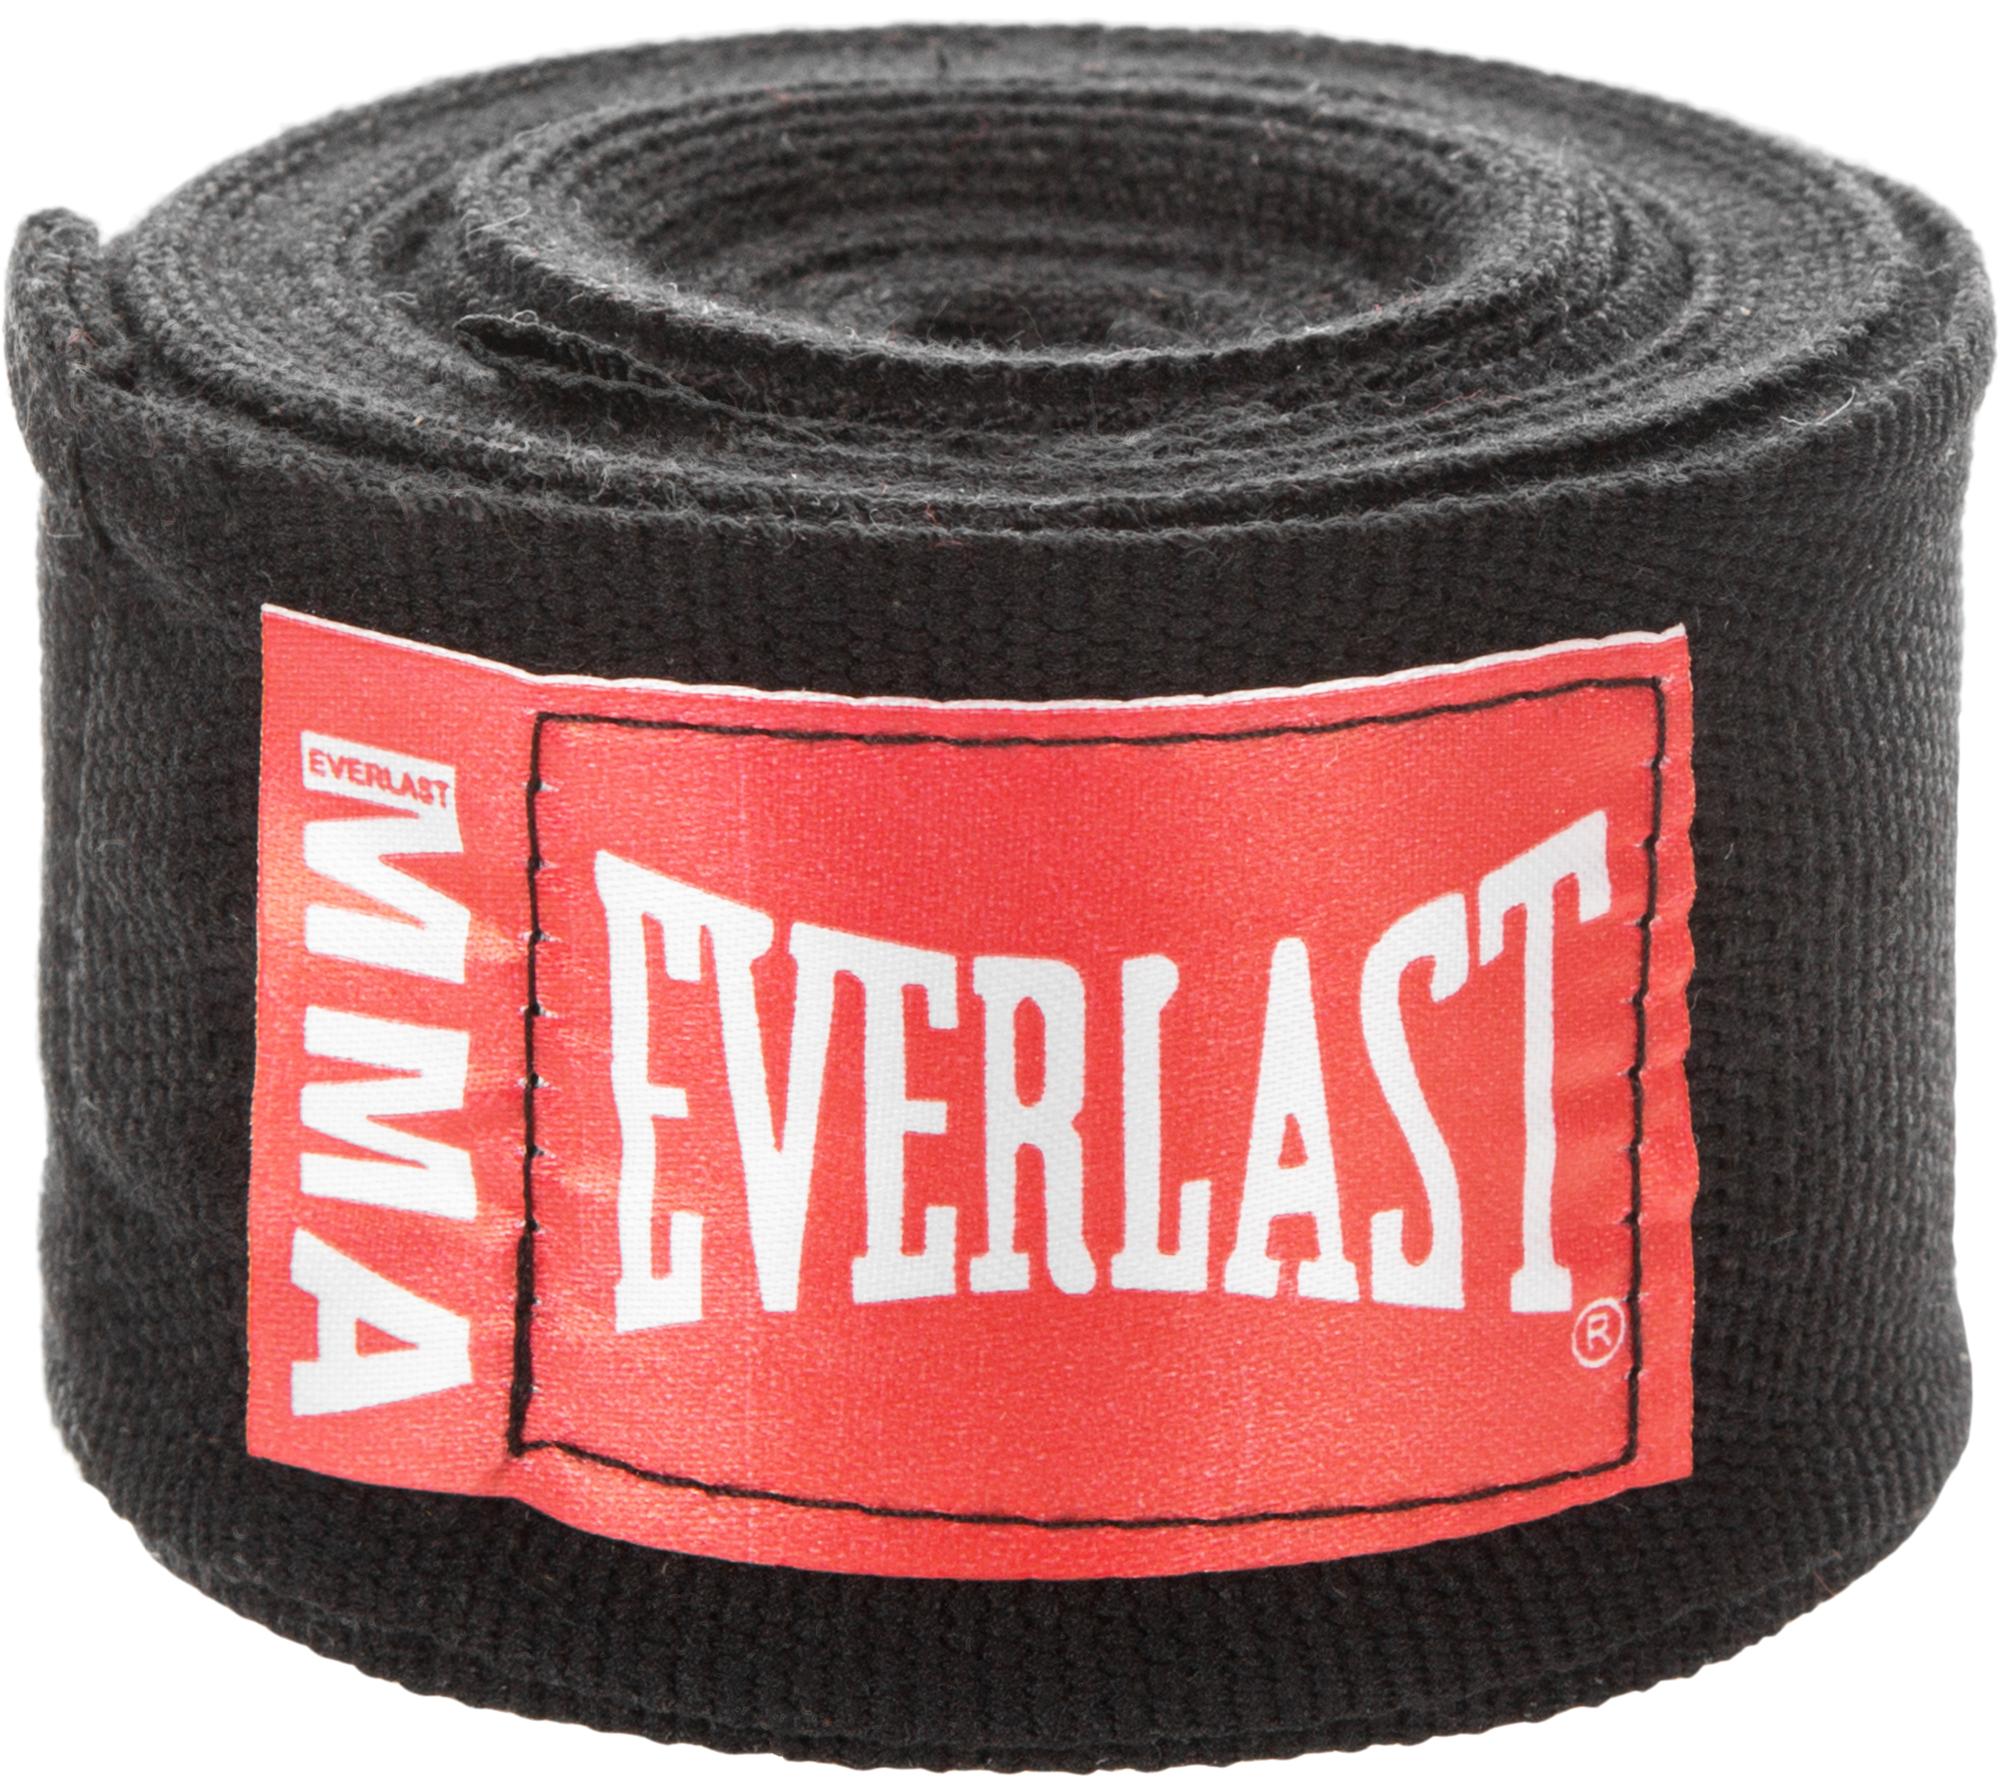 Everlast Бинт Everlast, 2,54 м, 2 шт.